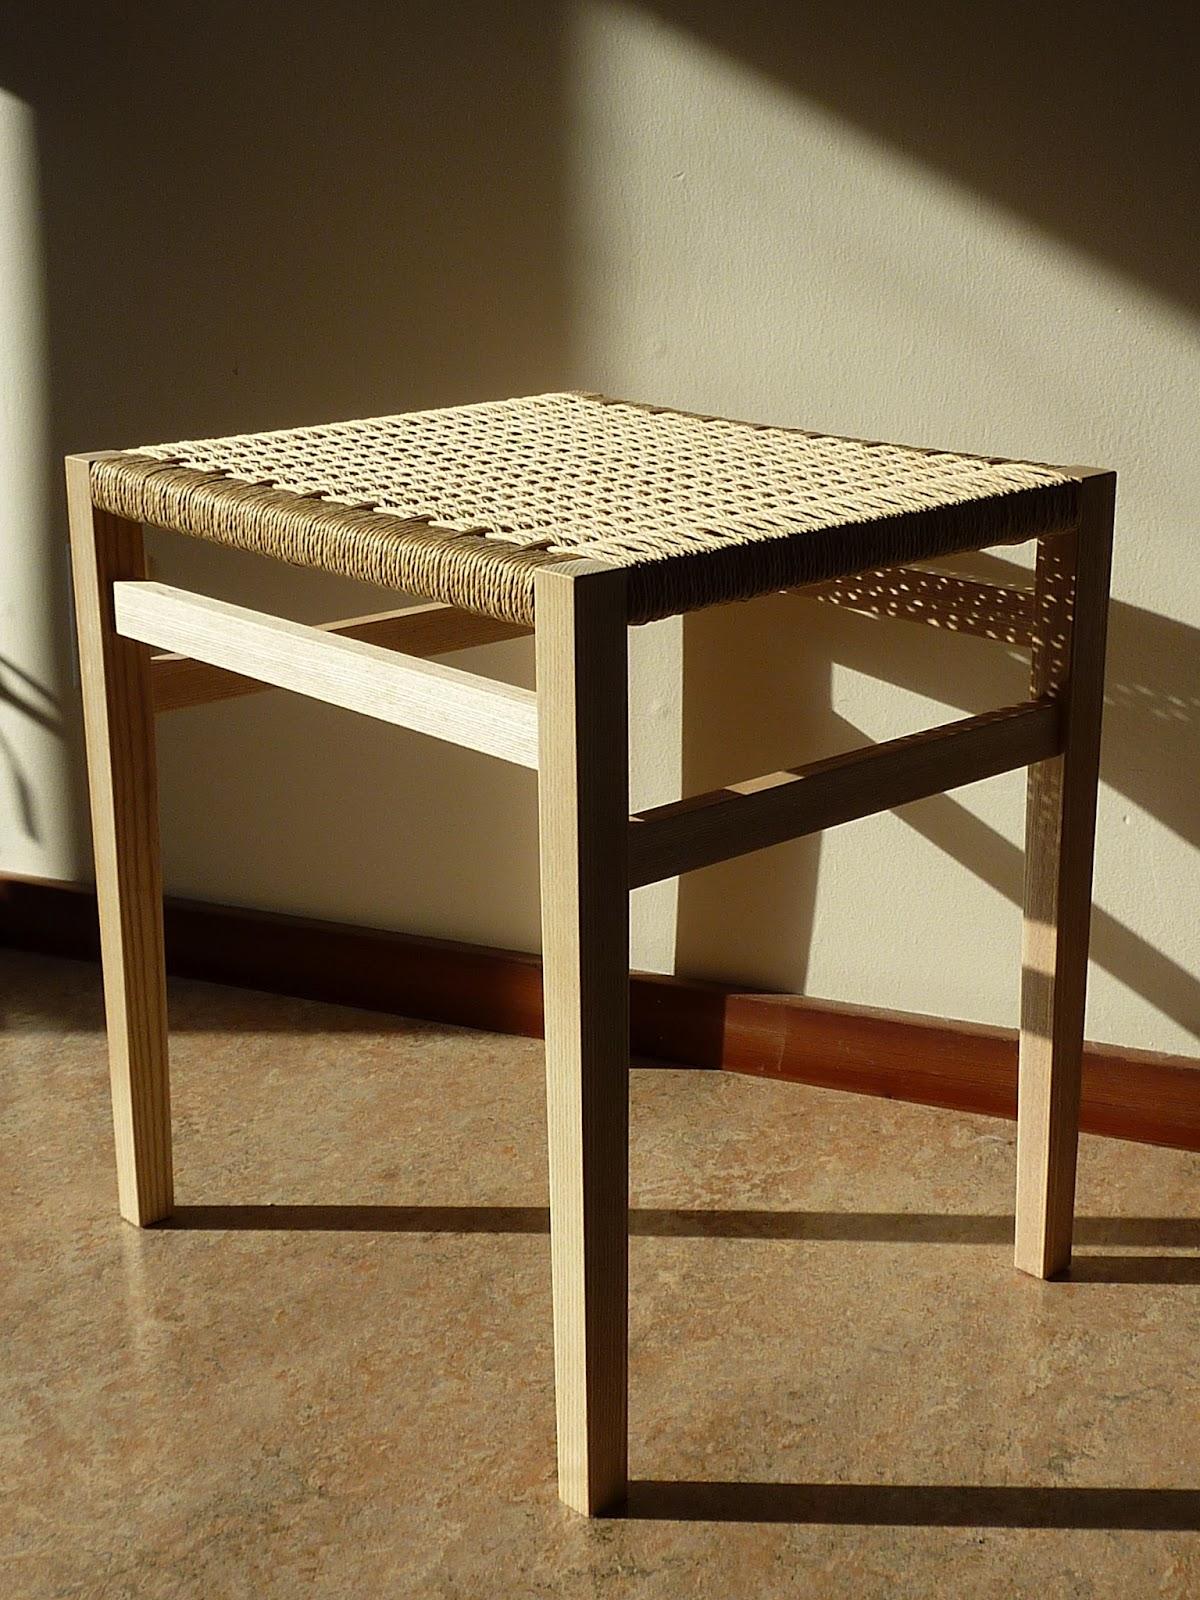 Killscrow Furniture